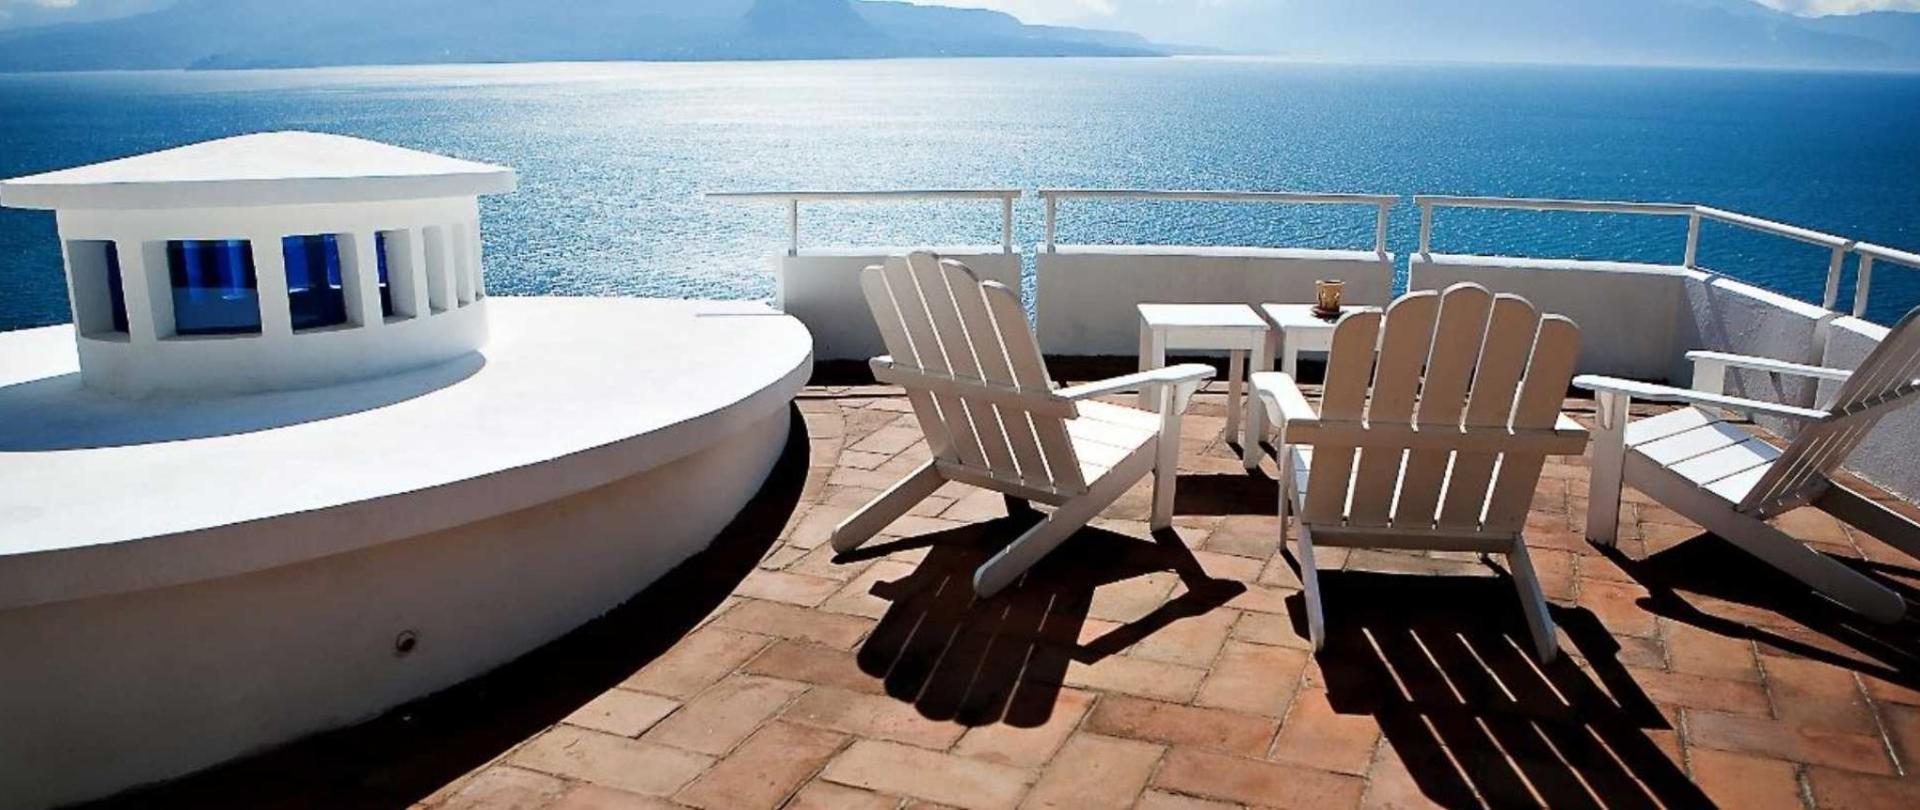 living-room-terrace-31-1.jpg.1920x807_default.jpg